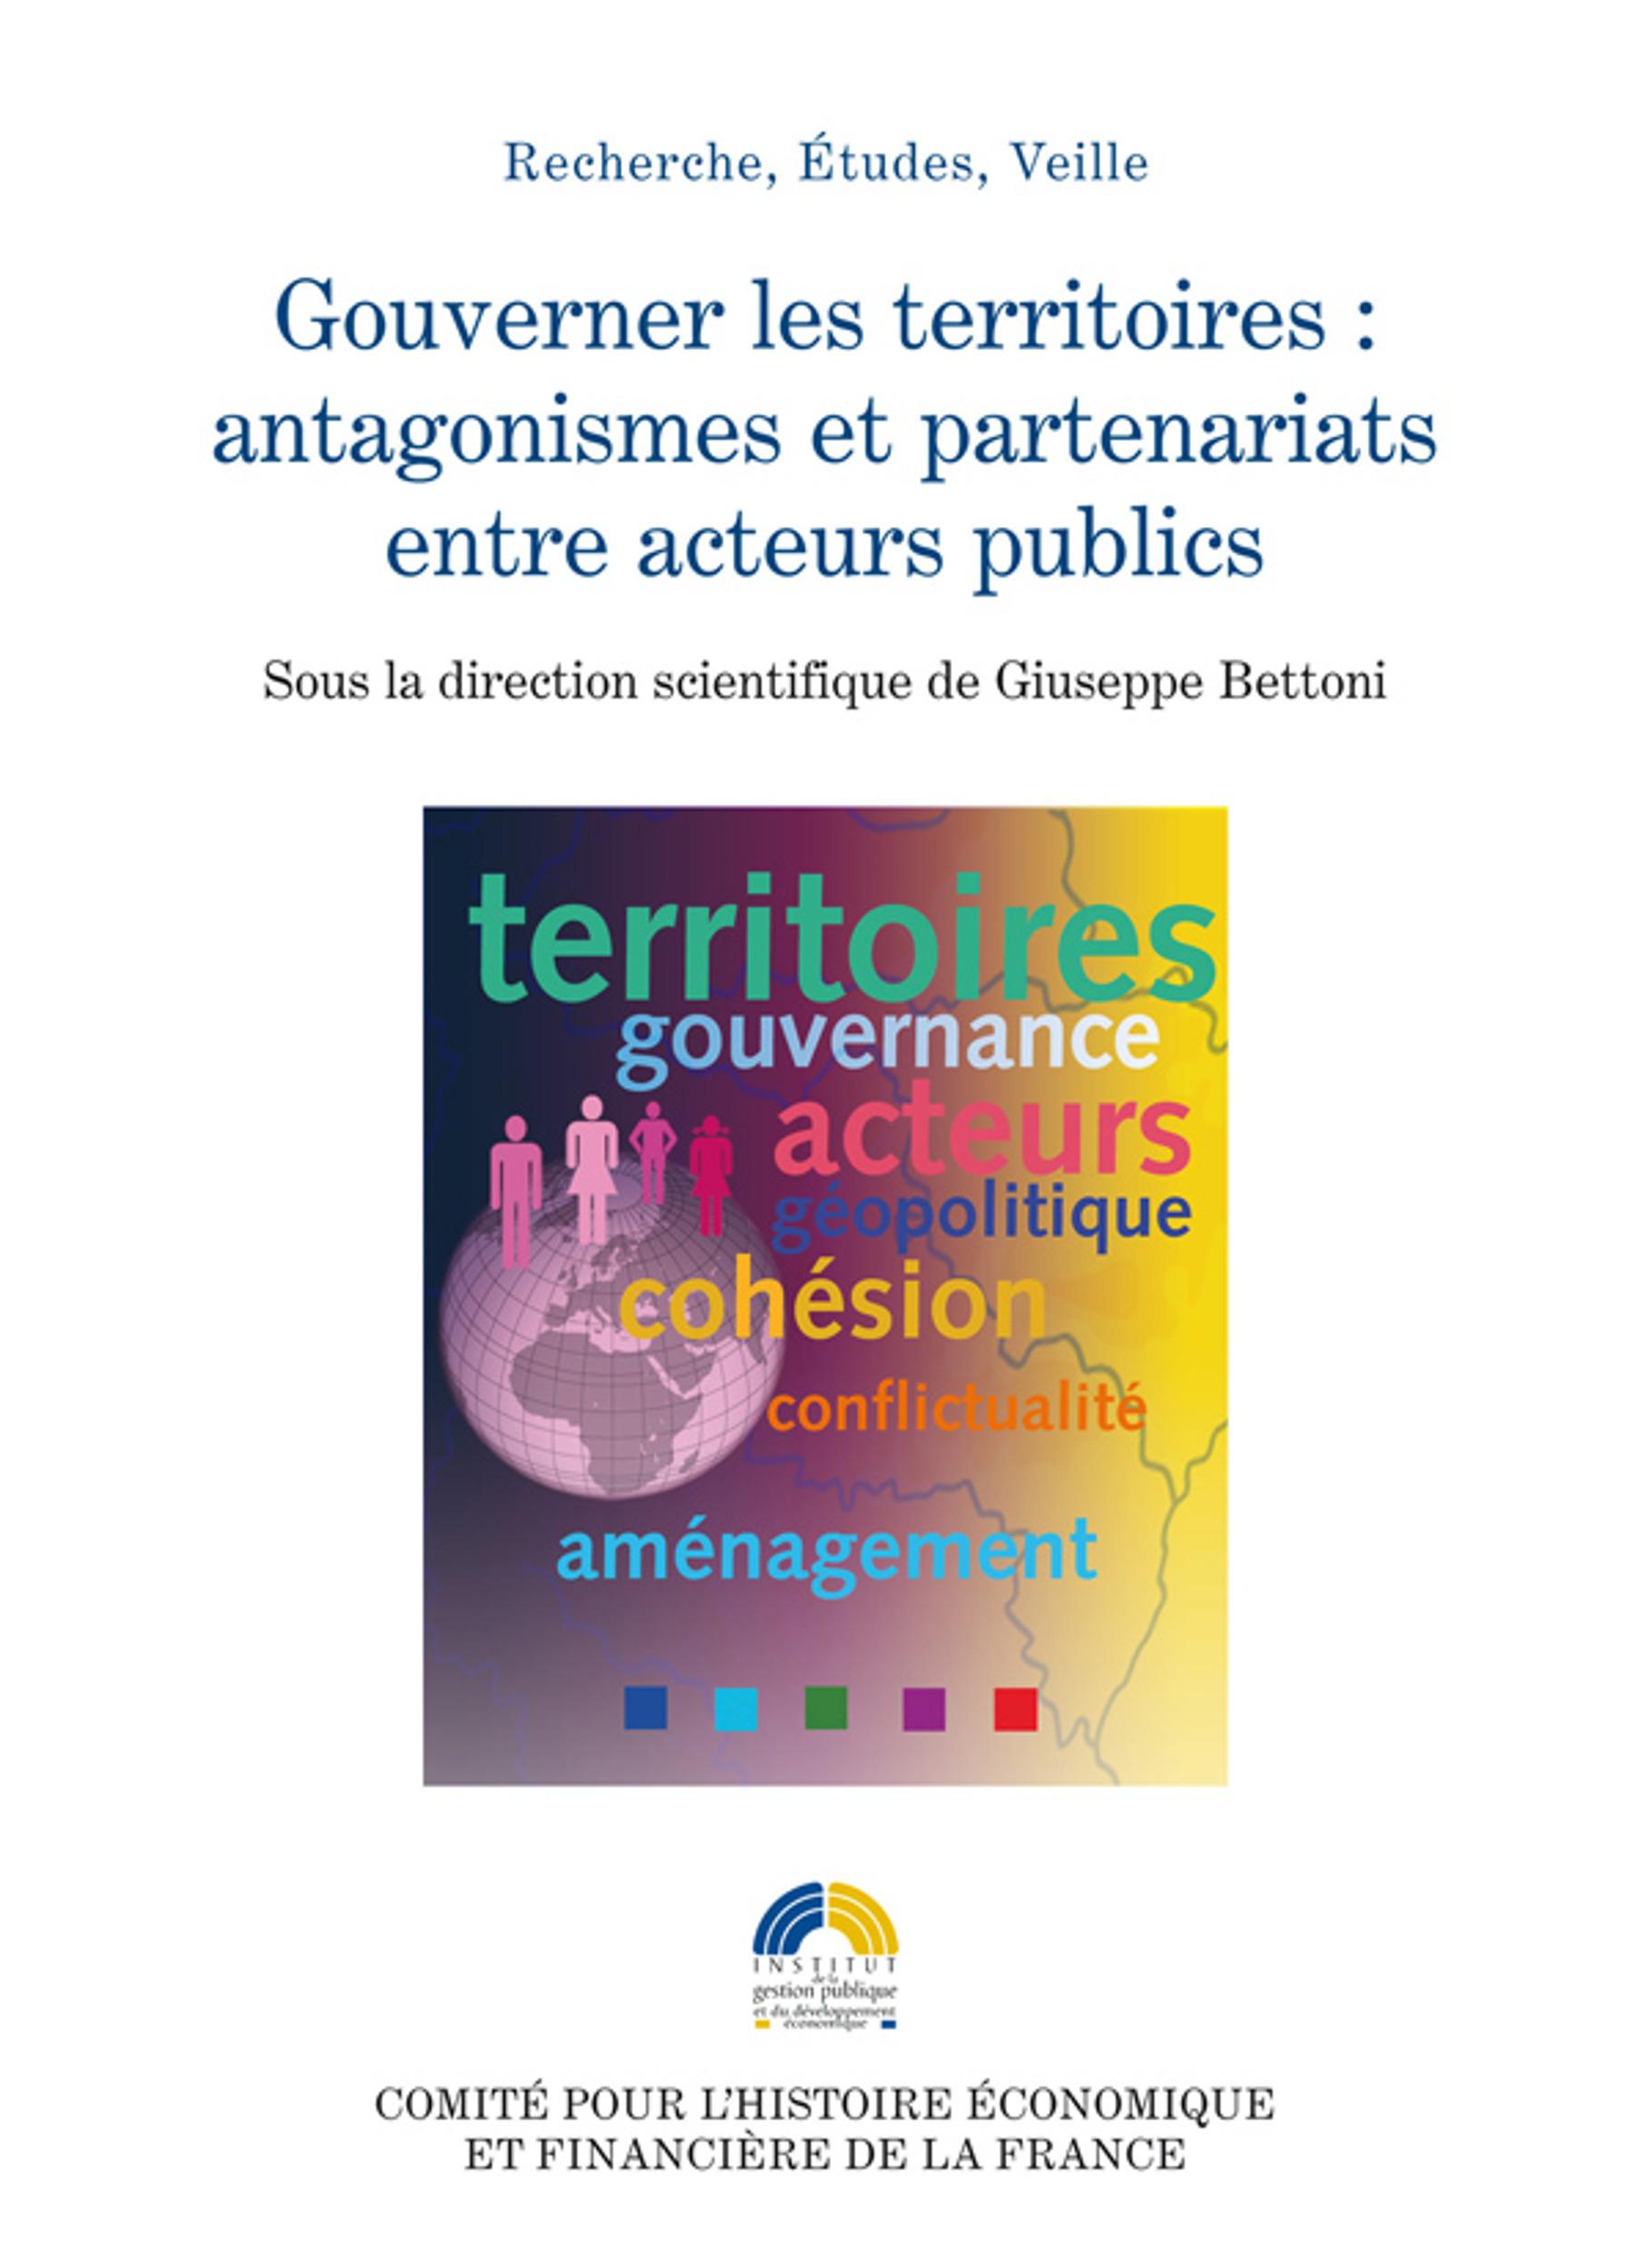 Gouverner les territoires : antagonismes et partenariats entre acteus publics